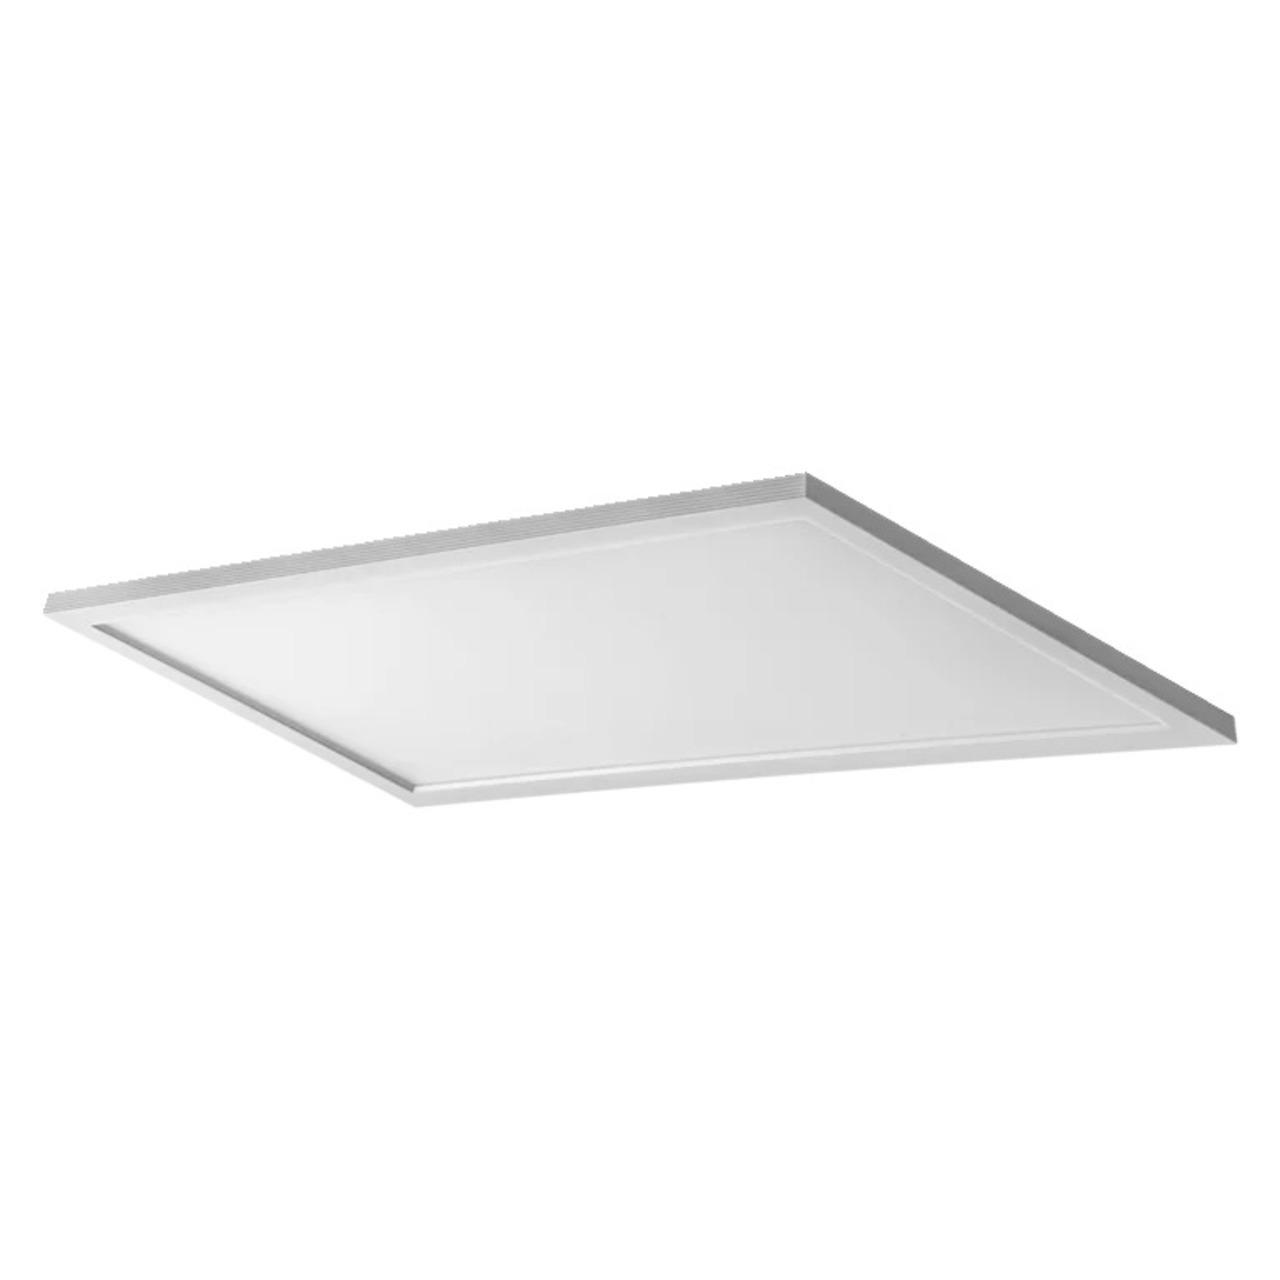 Ledvance PLANON PLUS 15-W-LED-Aufbaupanel 30 x 60 cm- warmweiss